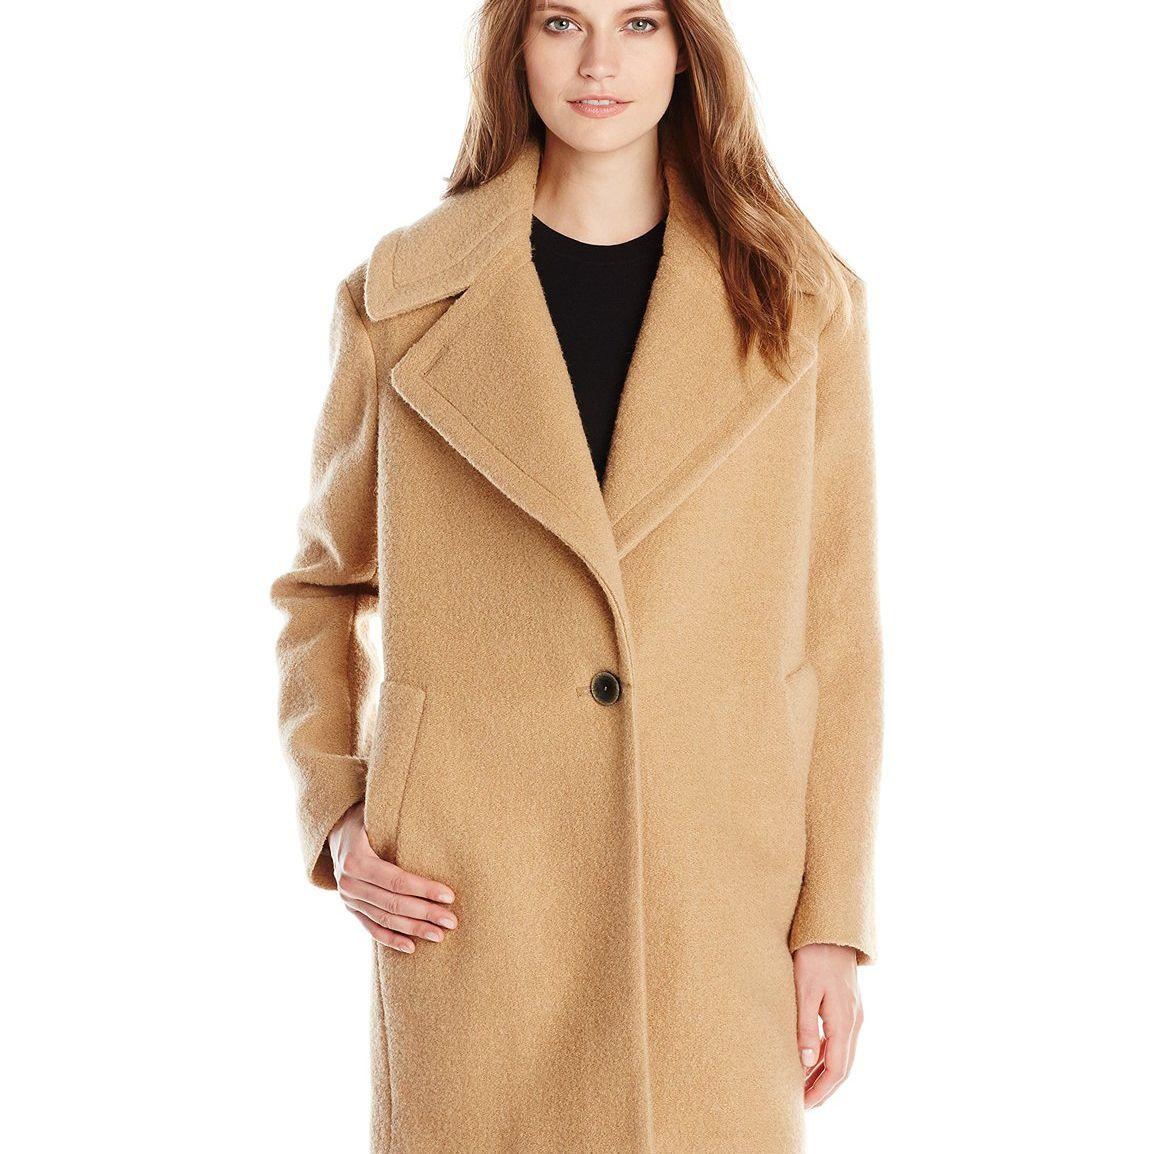 Kensie Women's Wool-Blend Cocoon Coat